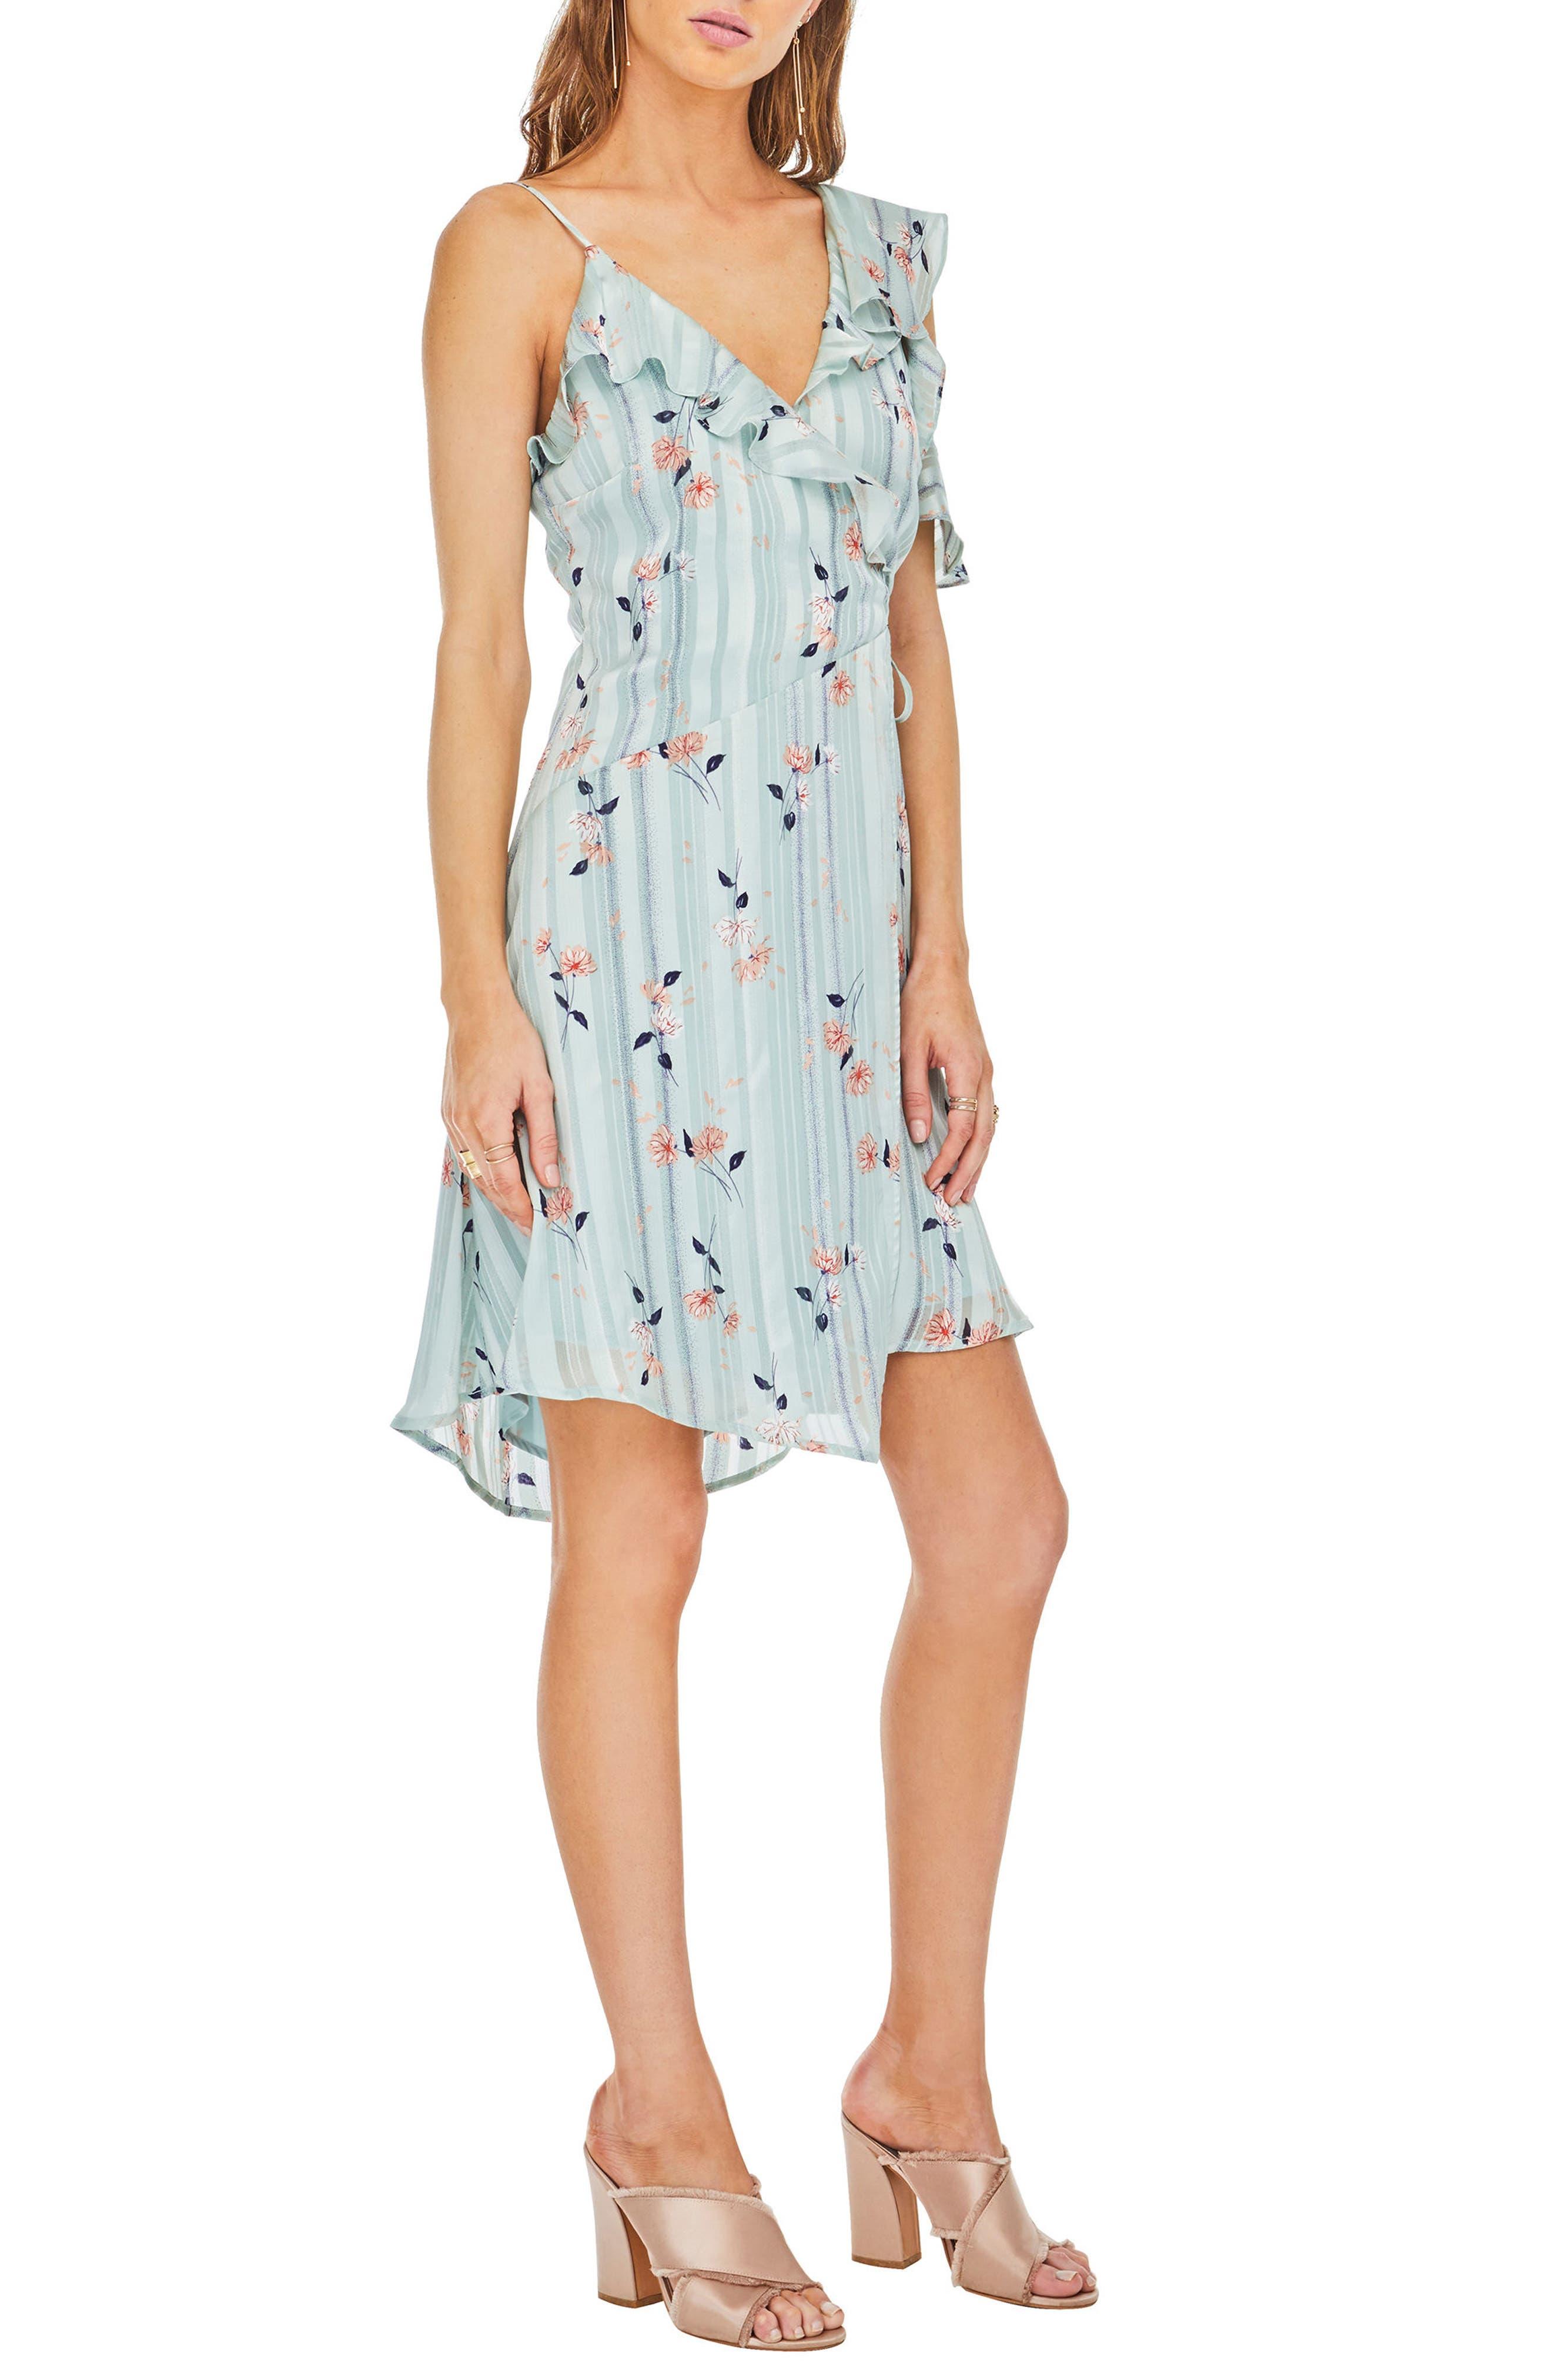 Josie Ruffle Dress,                             Alternate thumbnail 3, color,                             Mint Satin Floral